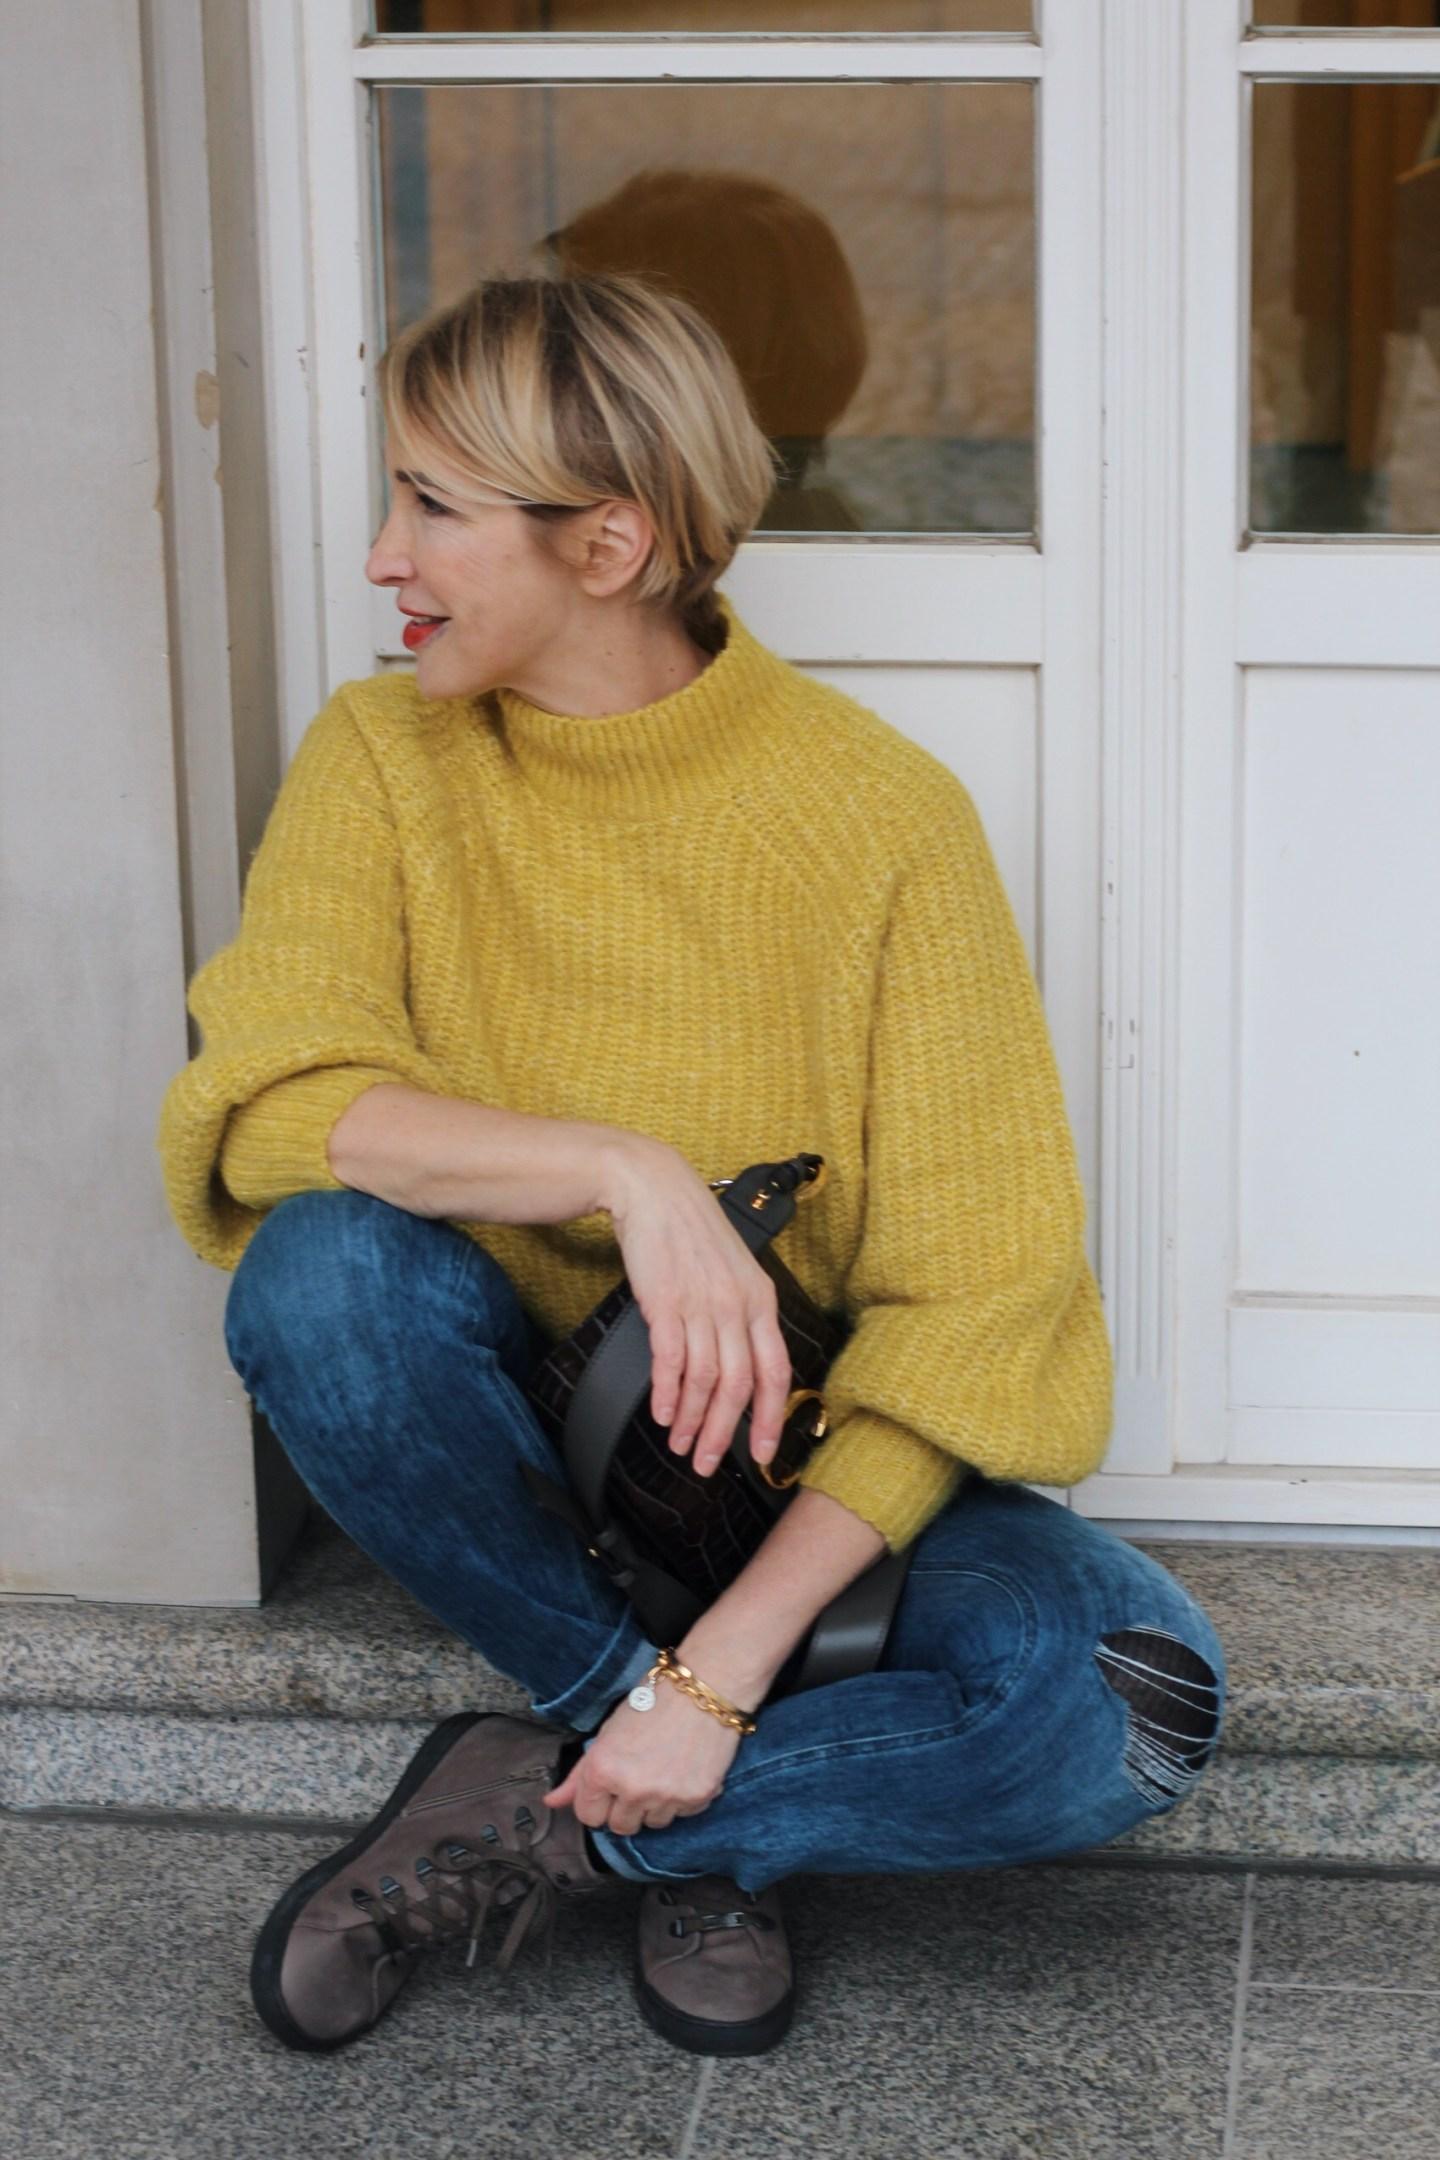 Glamupyourlifestyle Hartjes-Schuhe bequem Passform gute-Qualitaetue-40-blog ue-50-blog